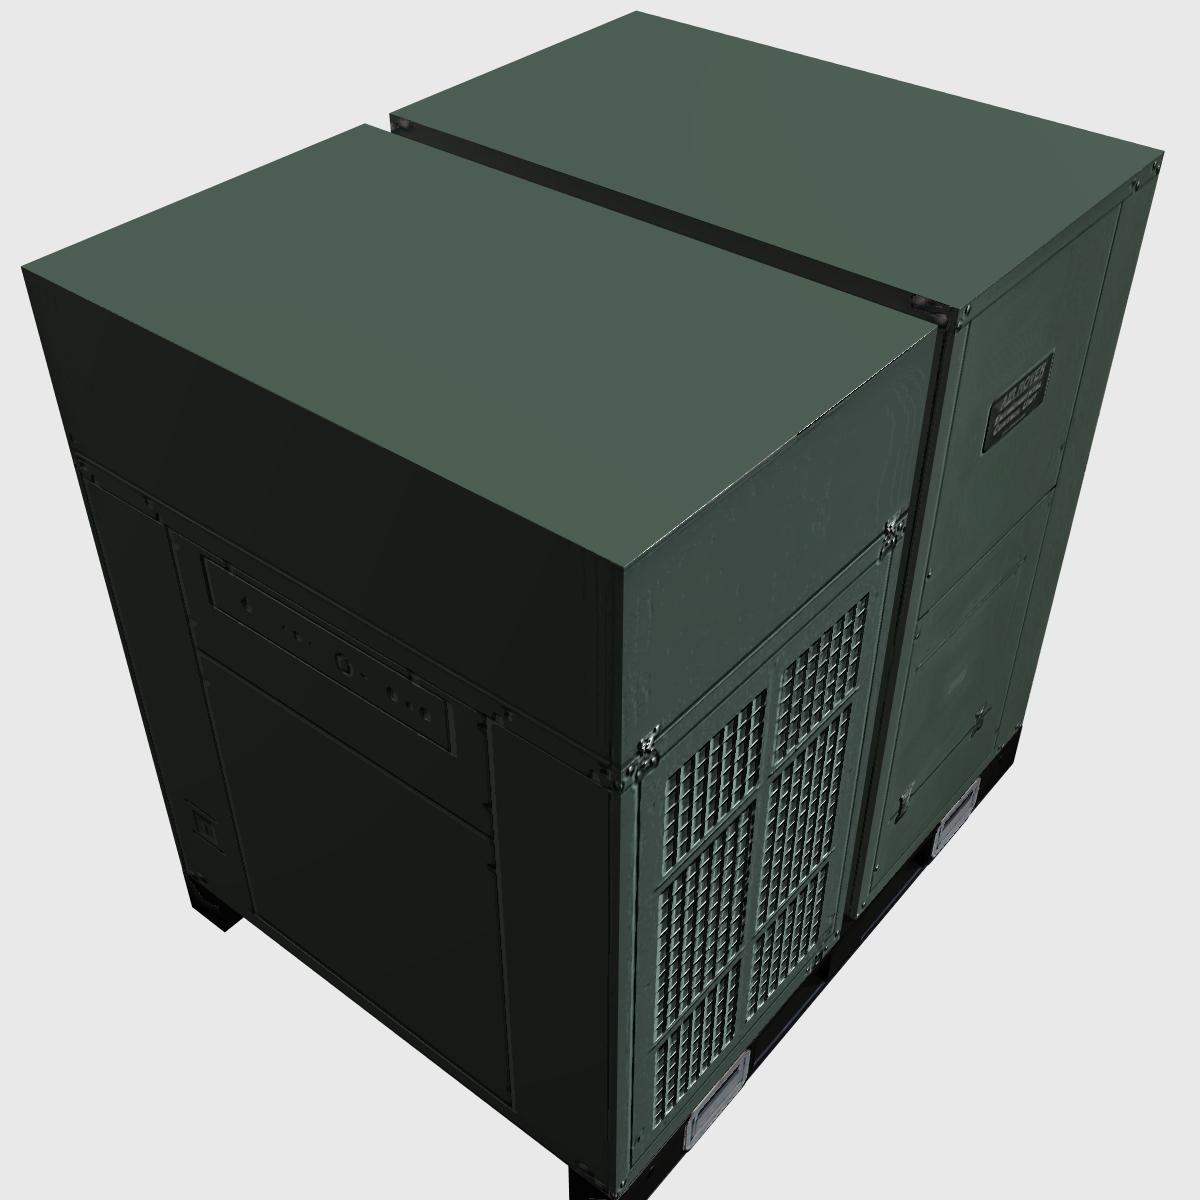 hvac air rover unit 3d model 3ds dxf cob x obj 153096